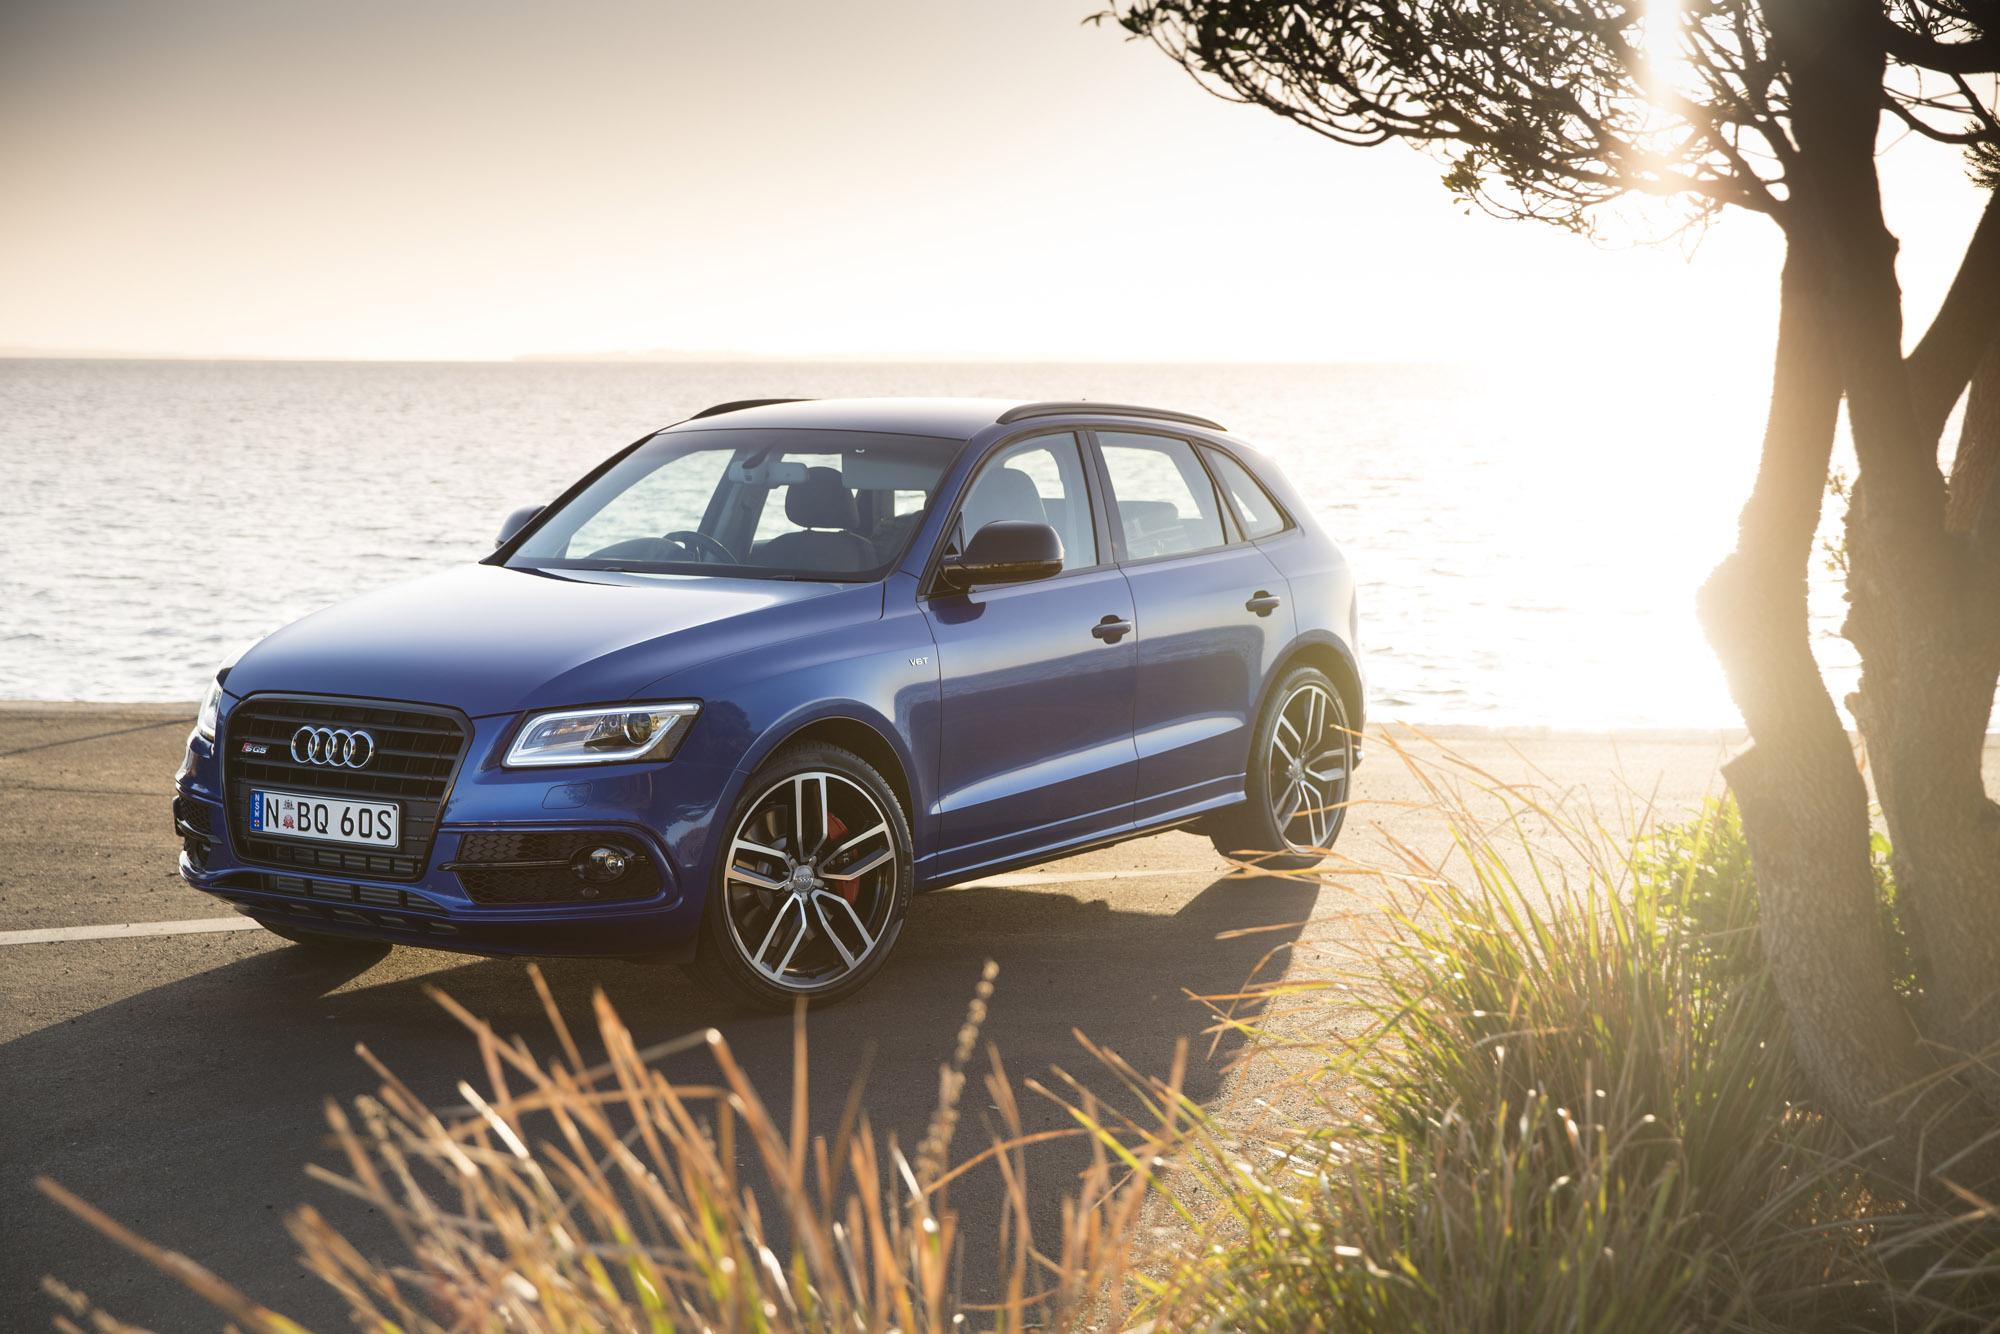 Audi Sq5 Specs